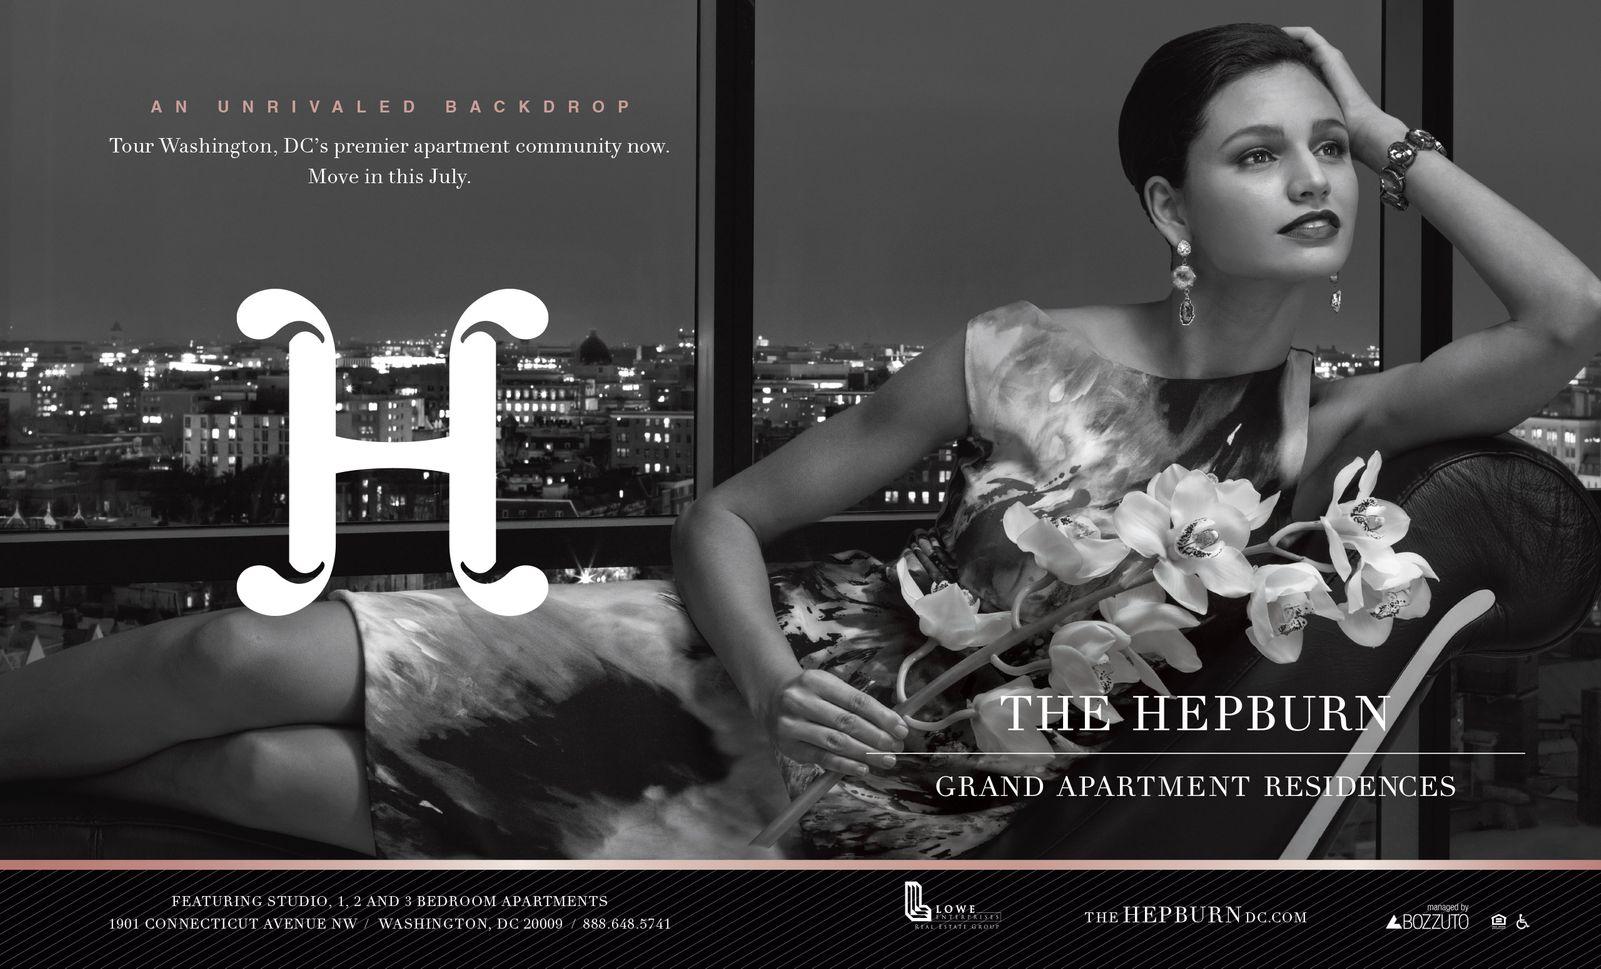 The-Hepburn-orchid_lb.jpg